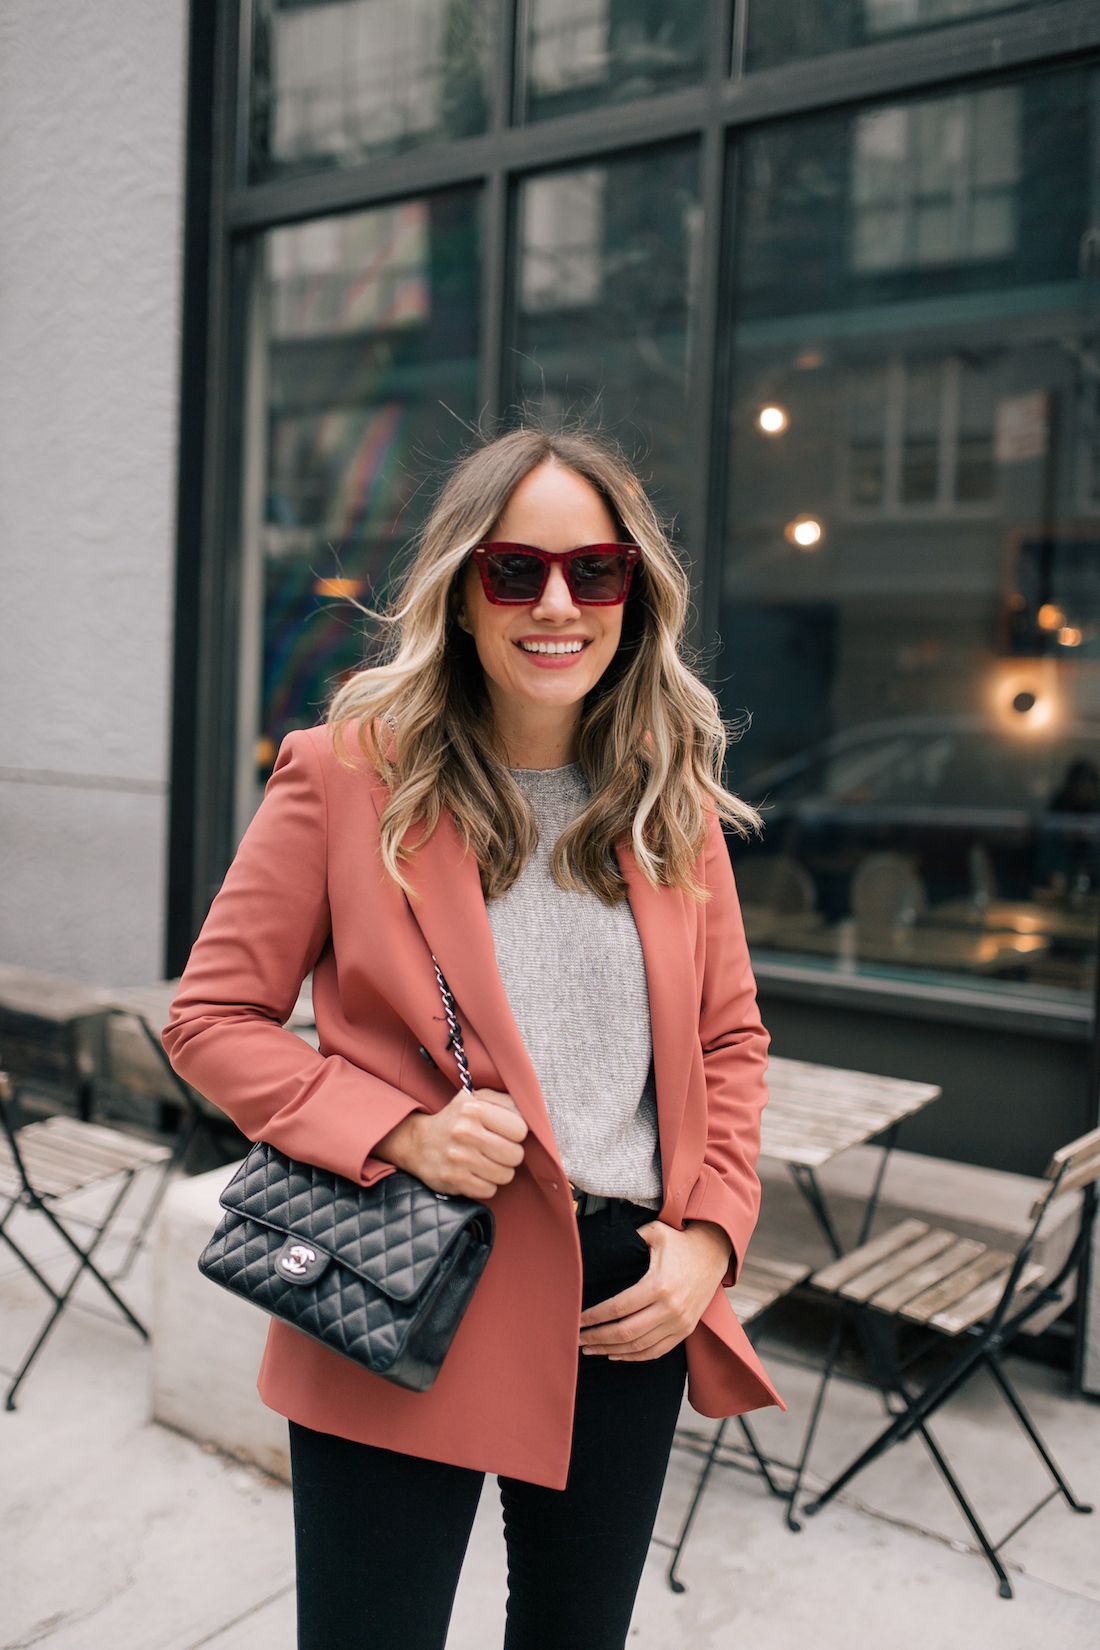 Outfit Details: Theory Blazer // Good American Jeans // Karen Walker Sunglasses // Chanel Purse